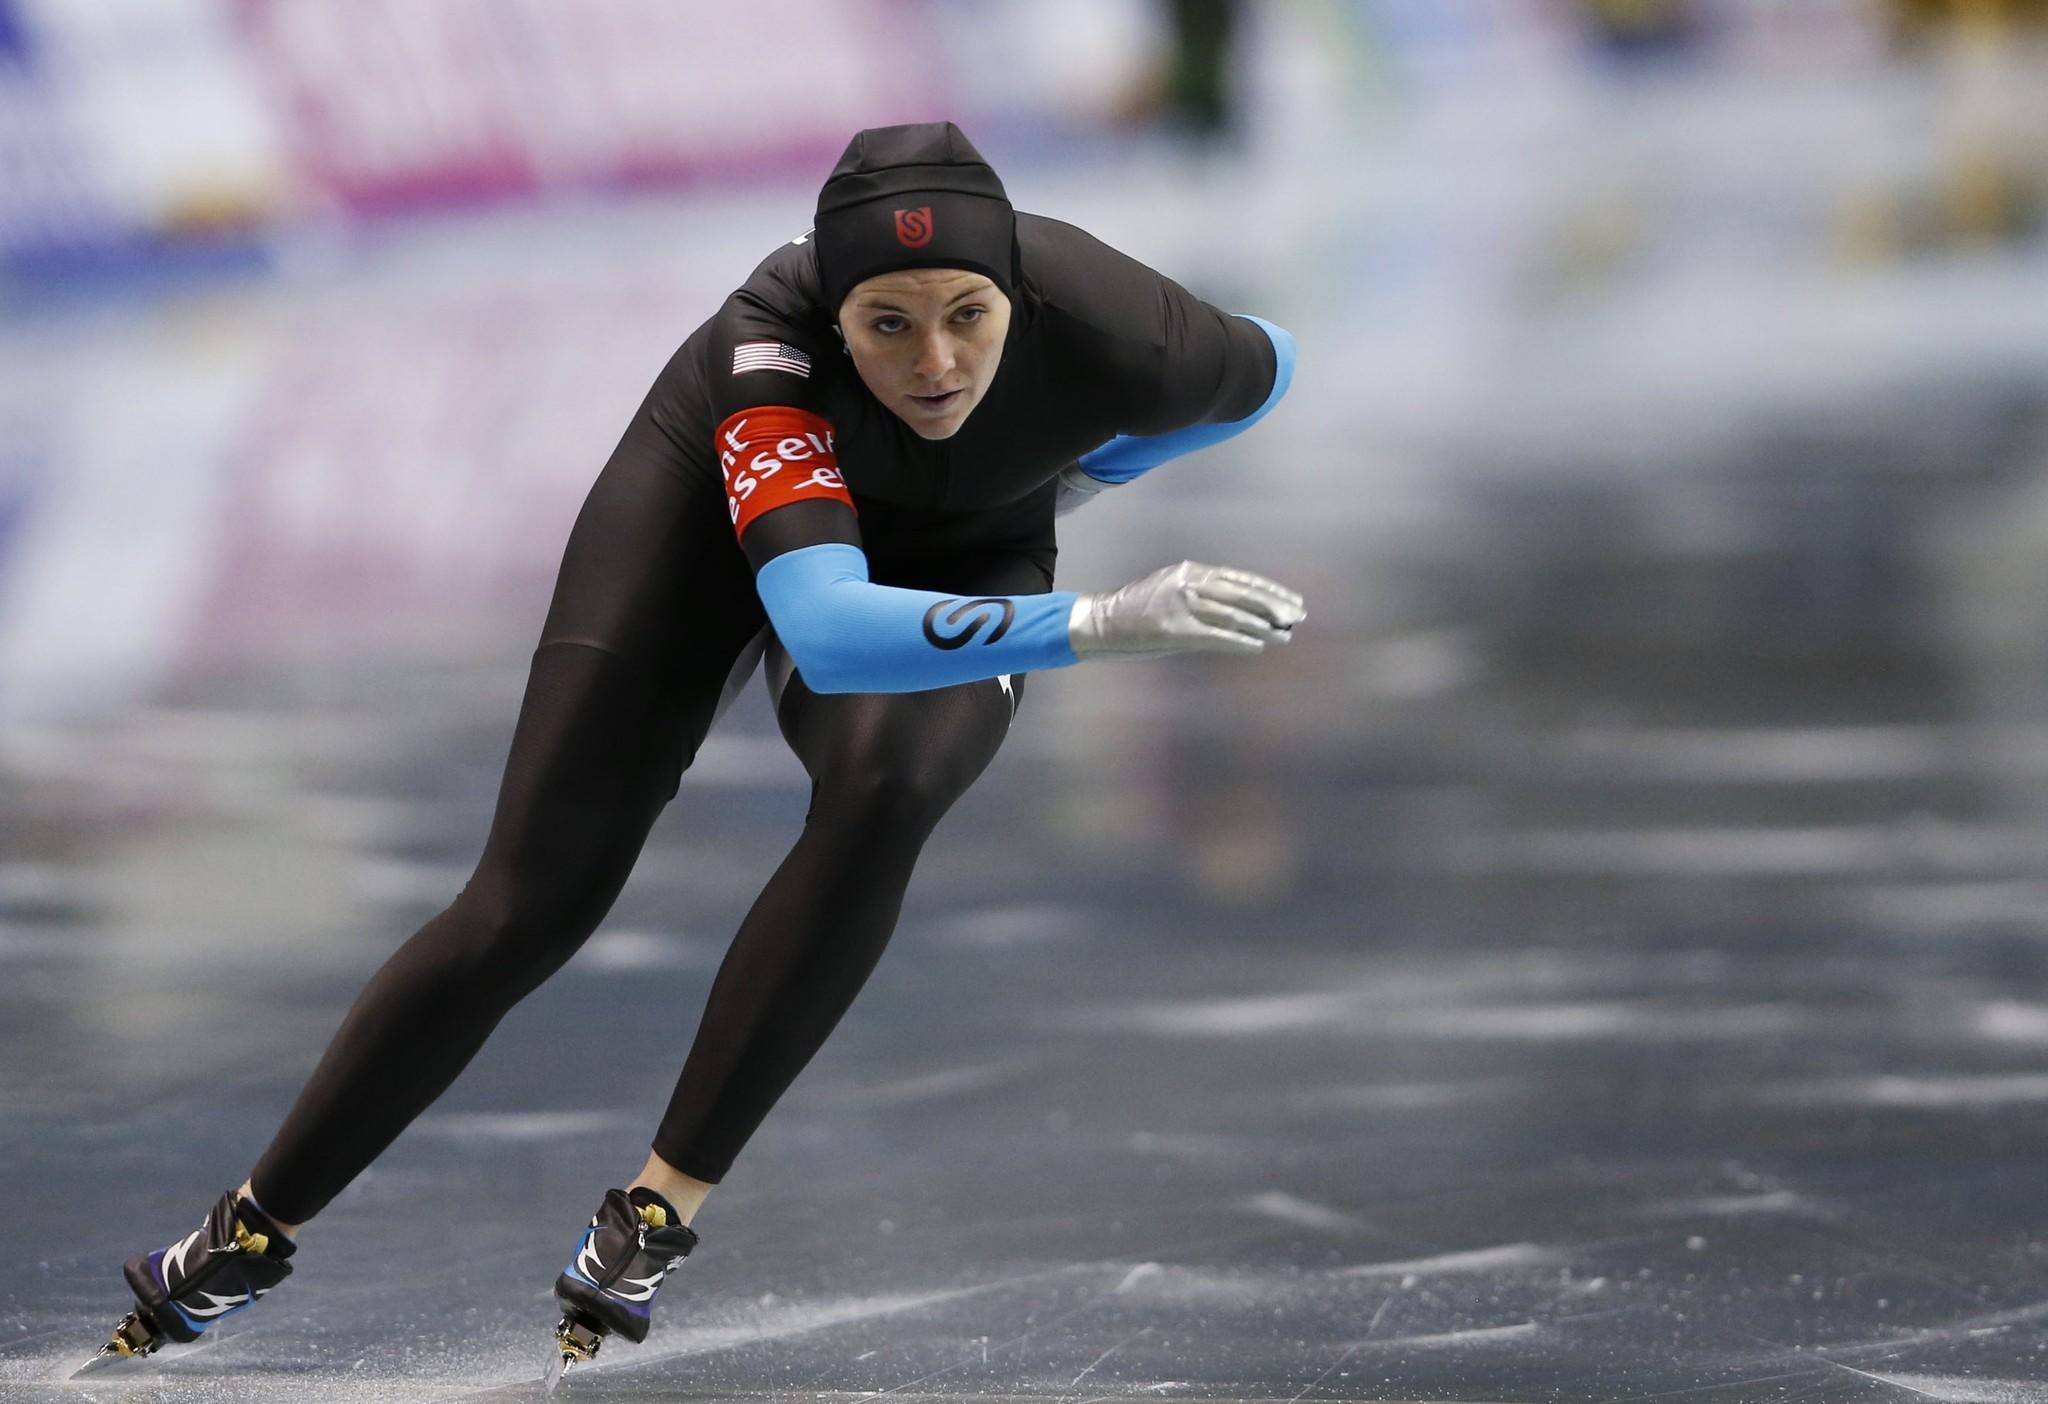 Heather Richardson races during the women's event. (Issei Kato/Reuters Photo)